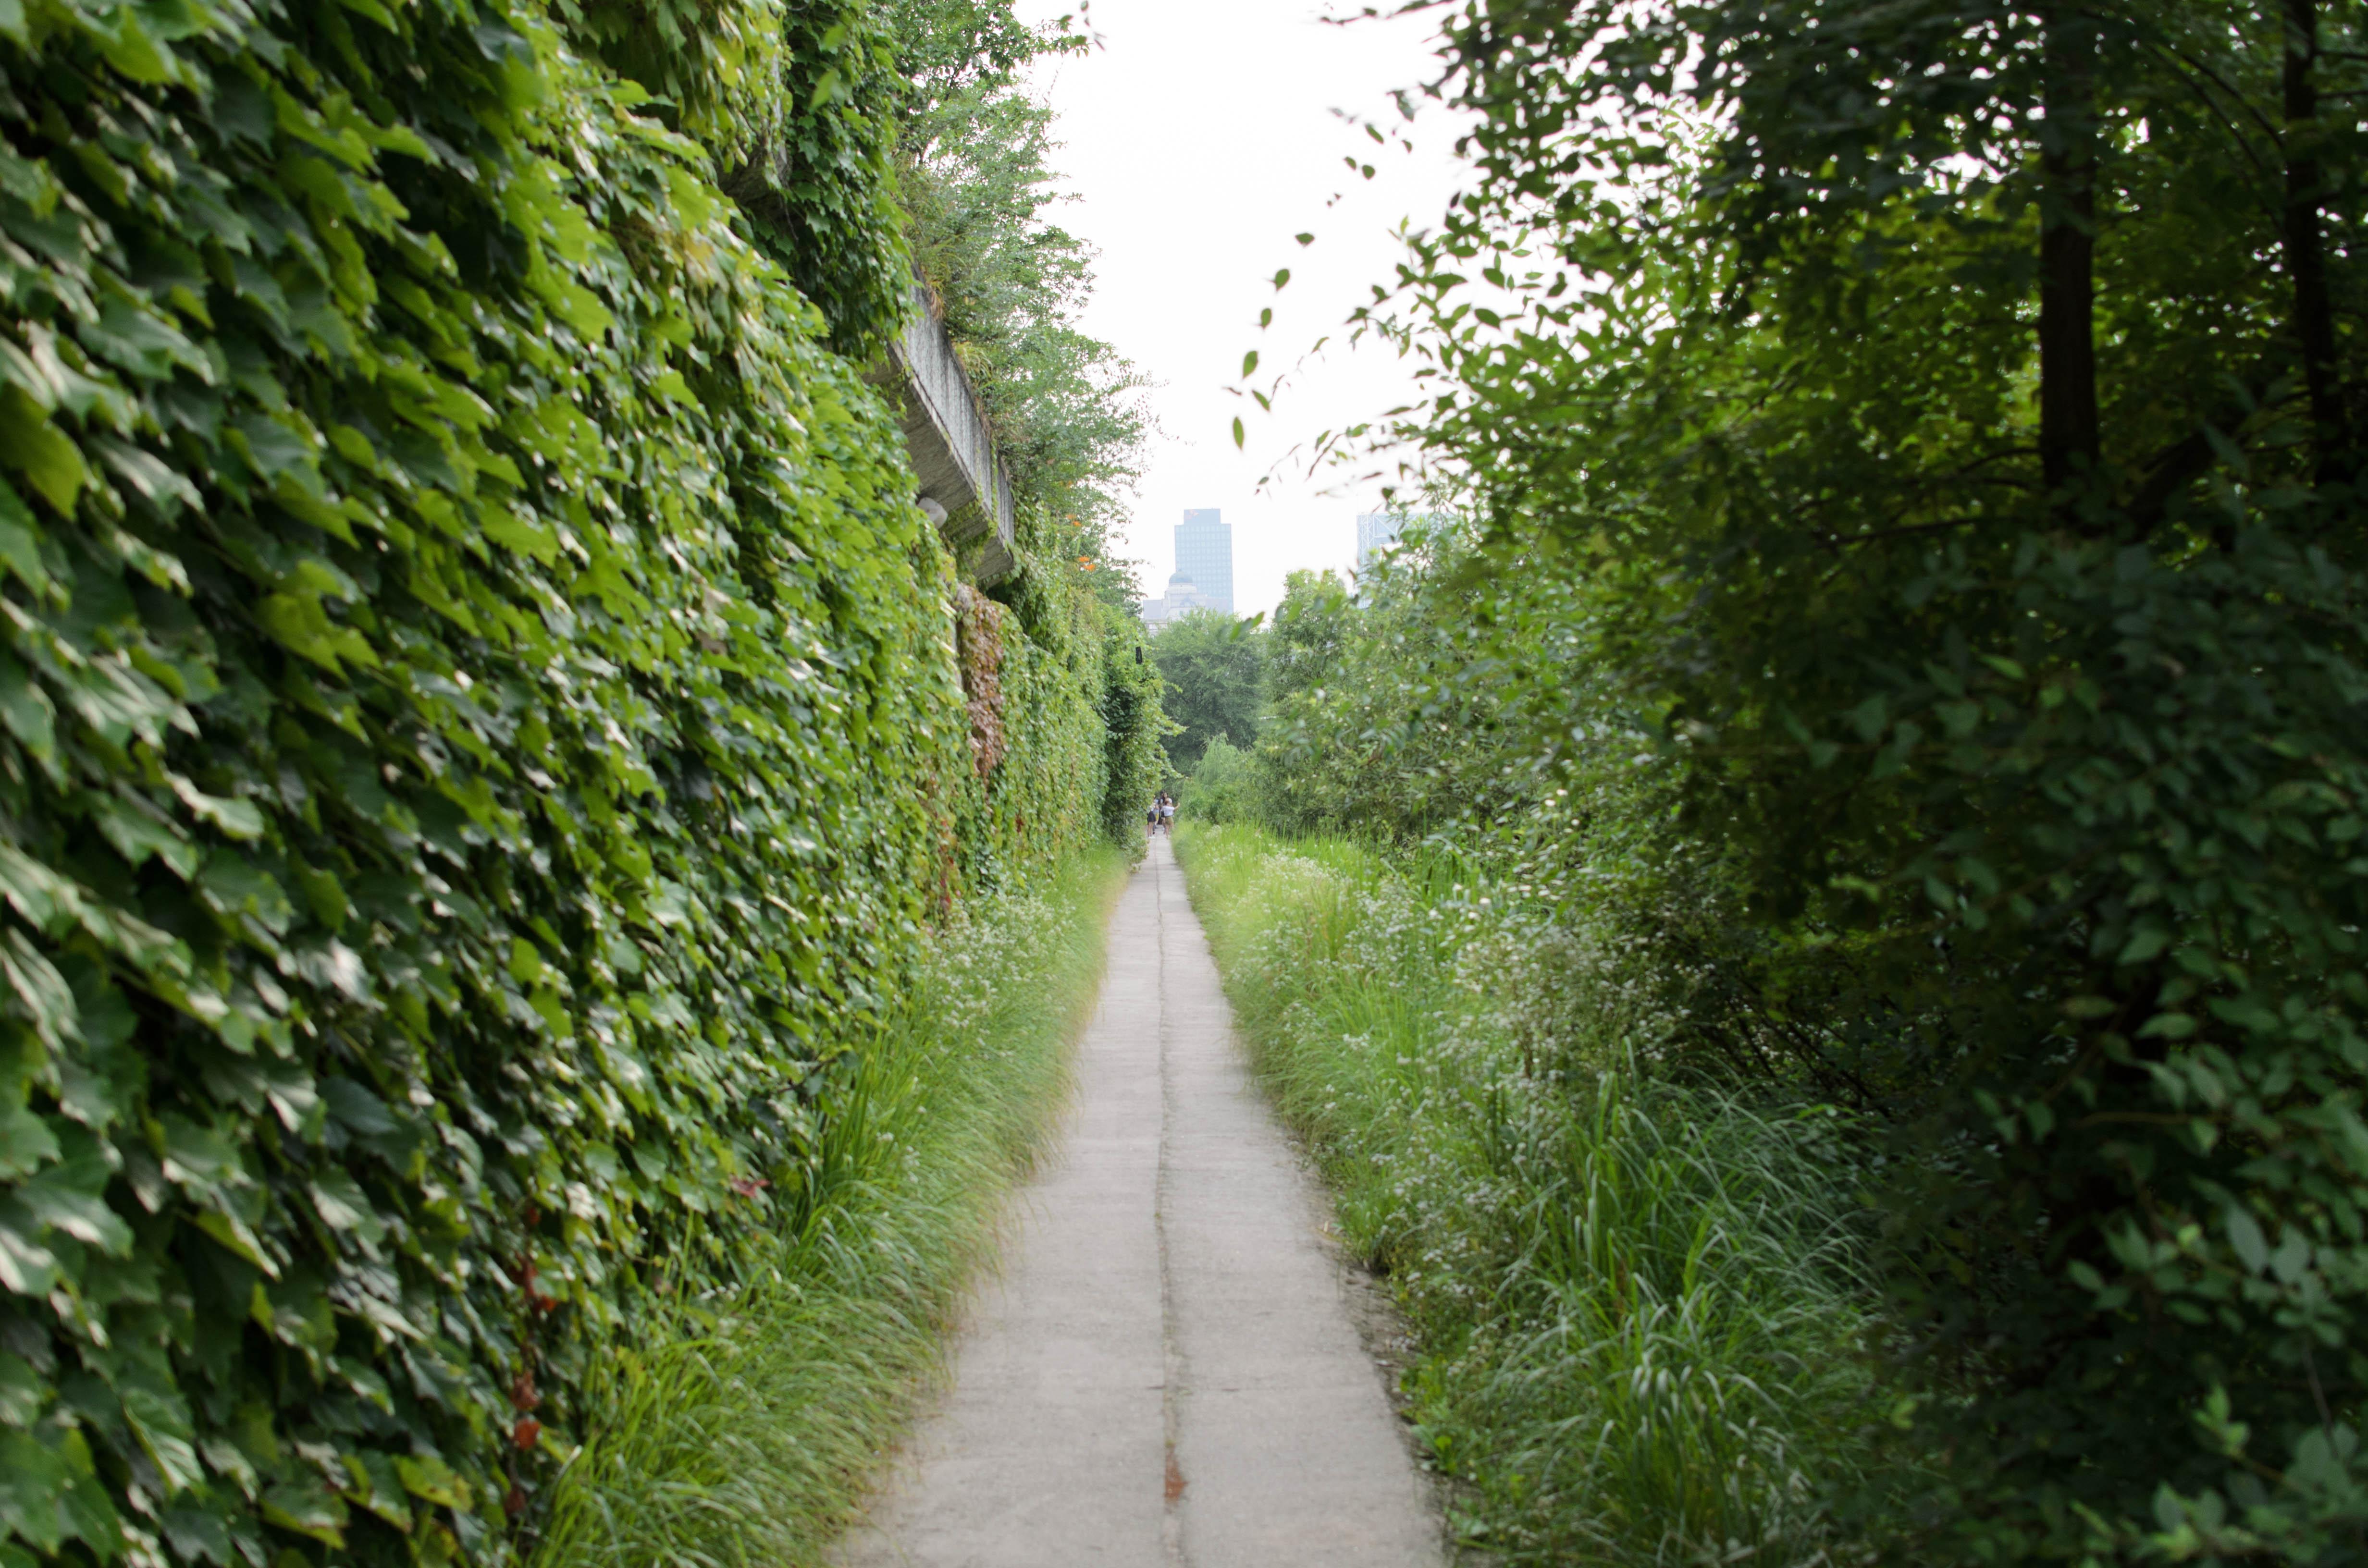 The secret garden path